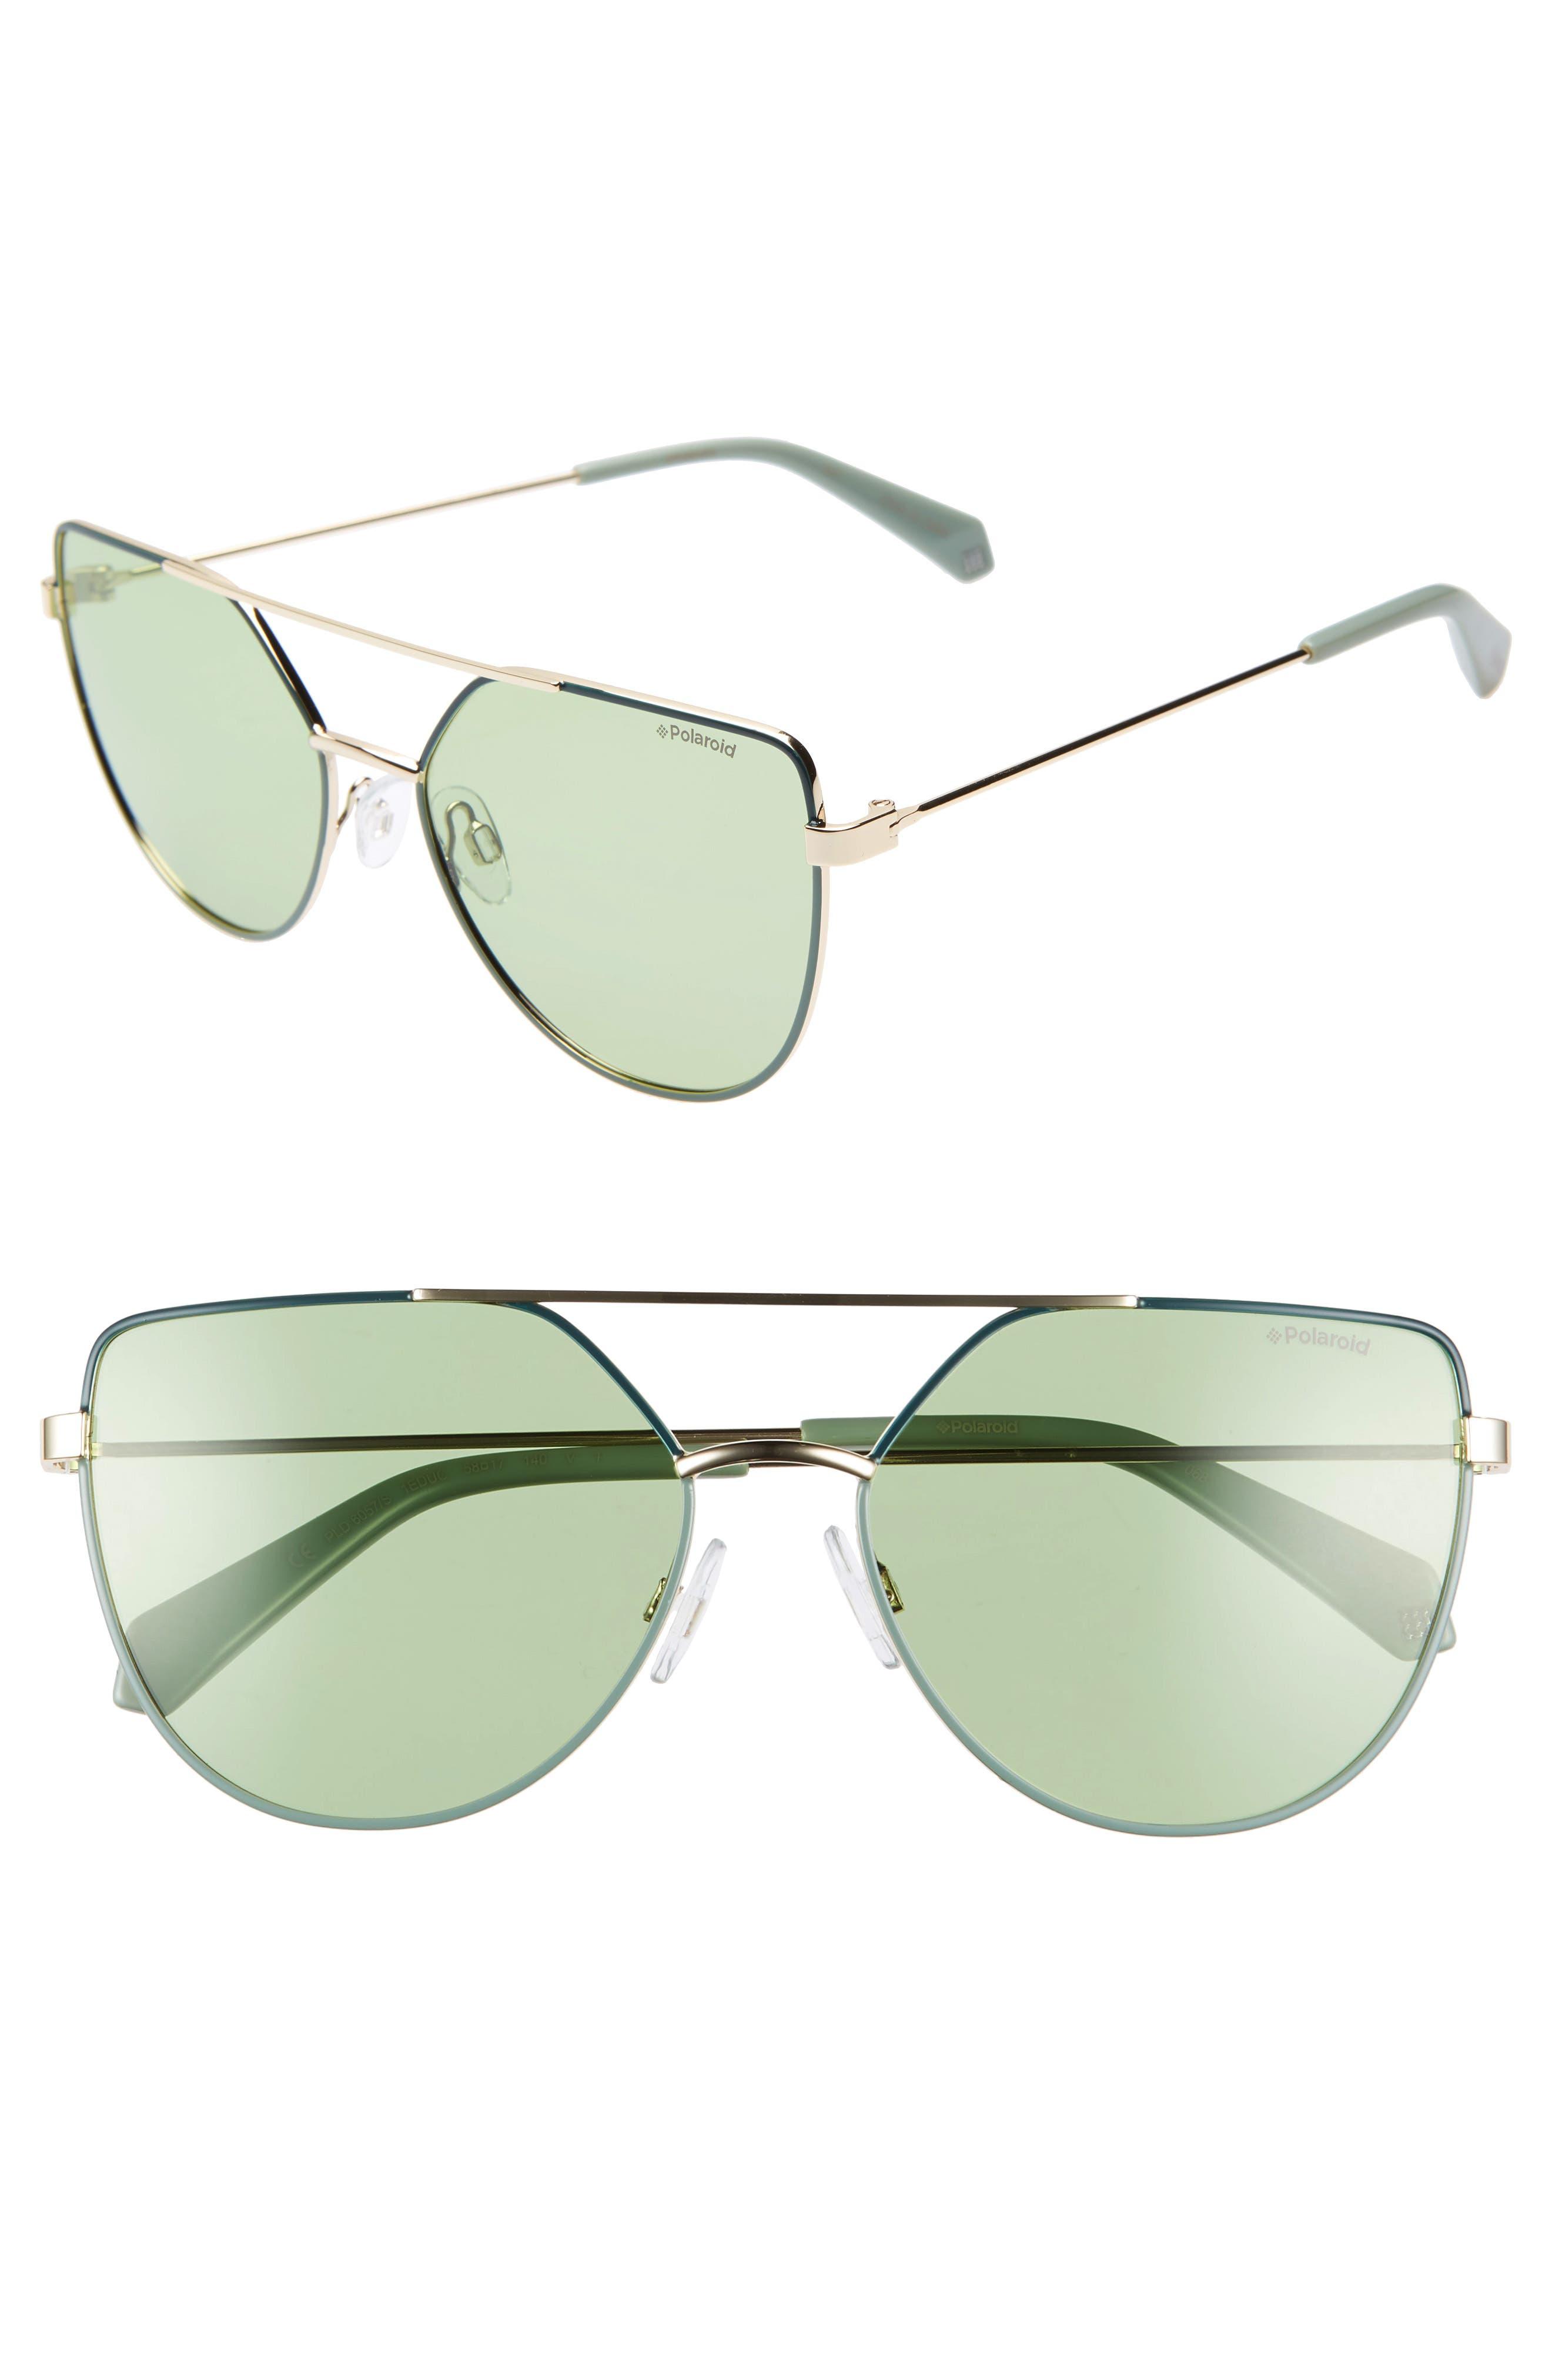 Polaroid 5m Polarized Sunglasses - Green/ Gold